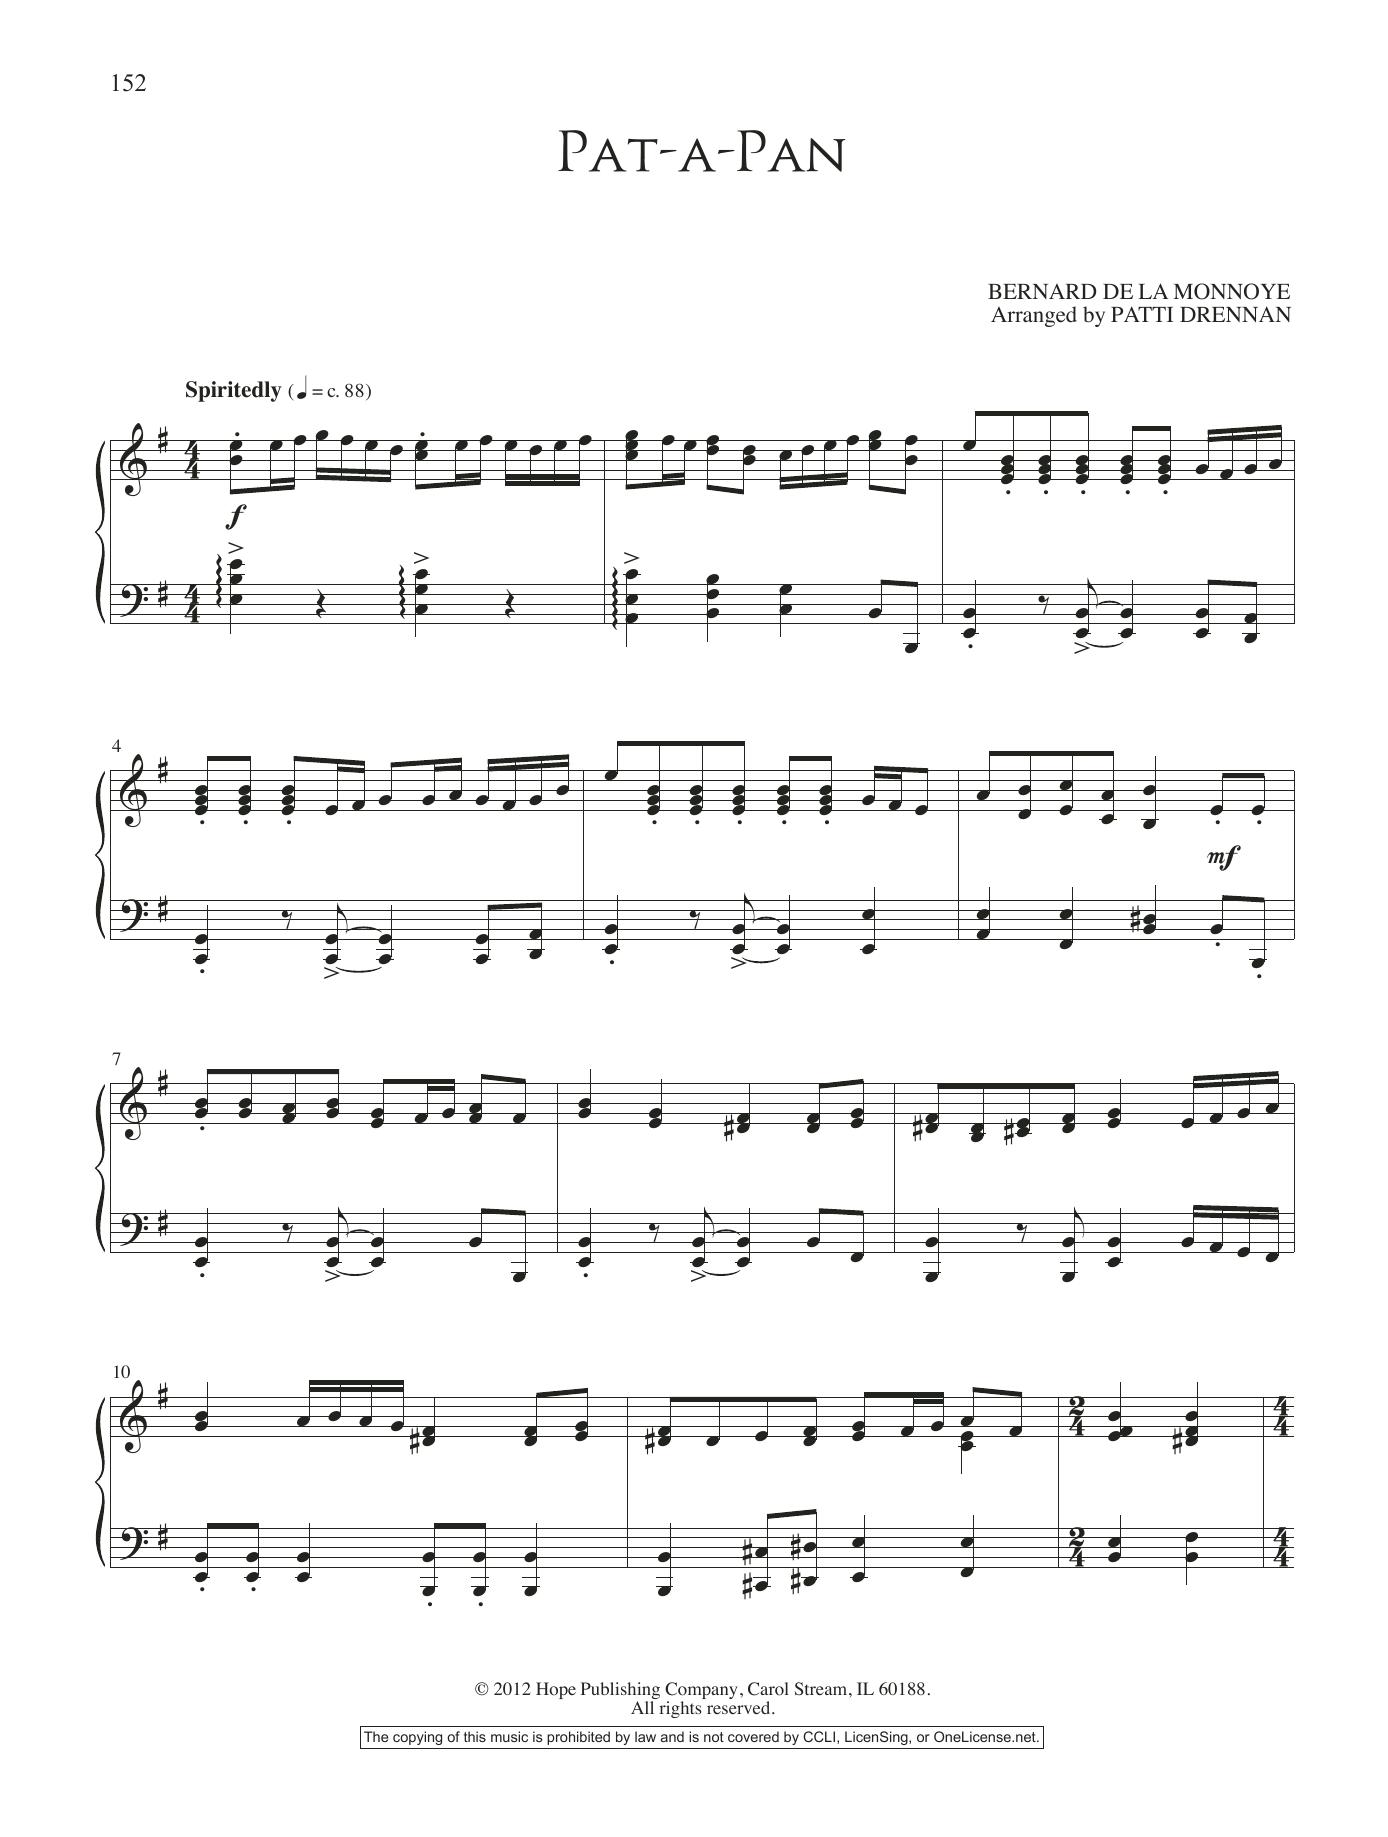 Patti Drennan Pat-a-Pan sheet music notes and chords. Download Printable PDF.